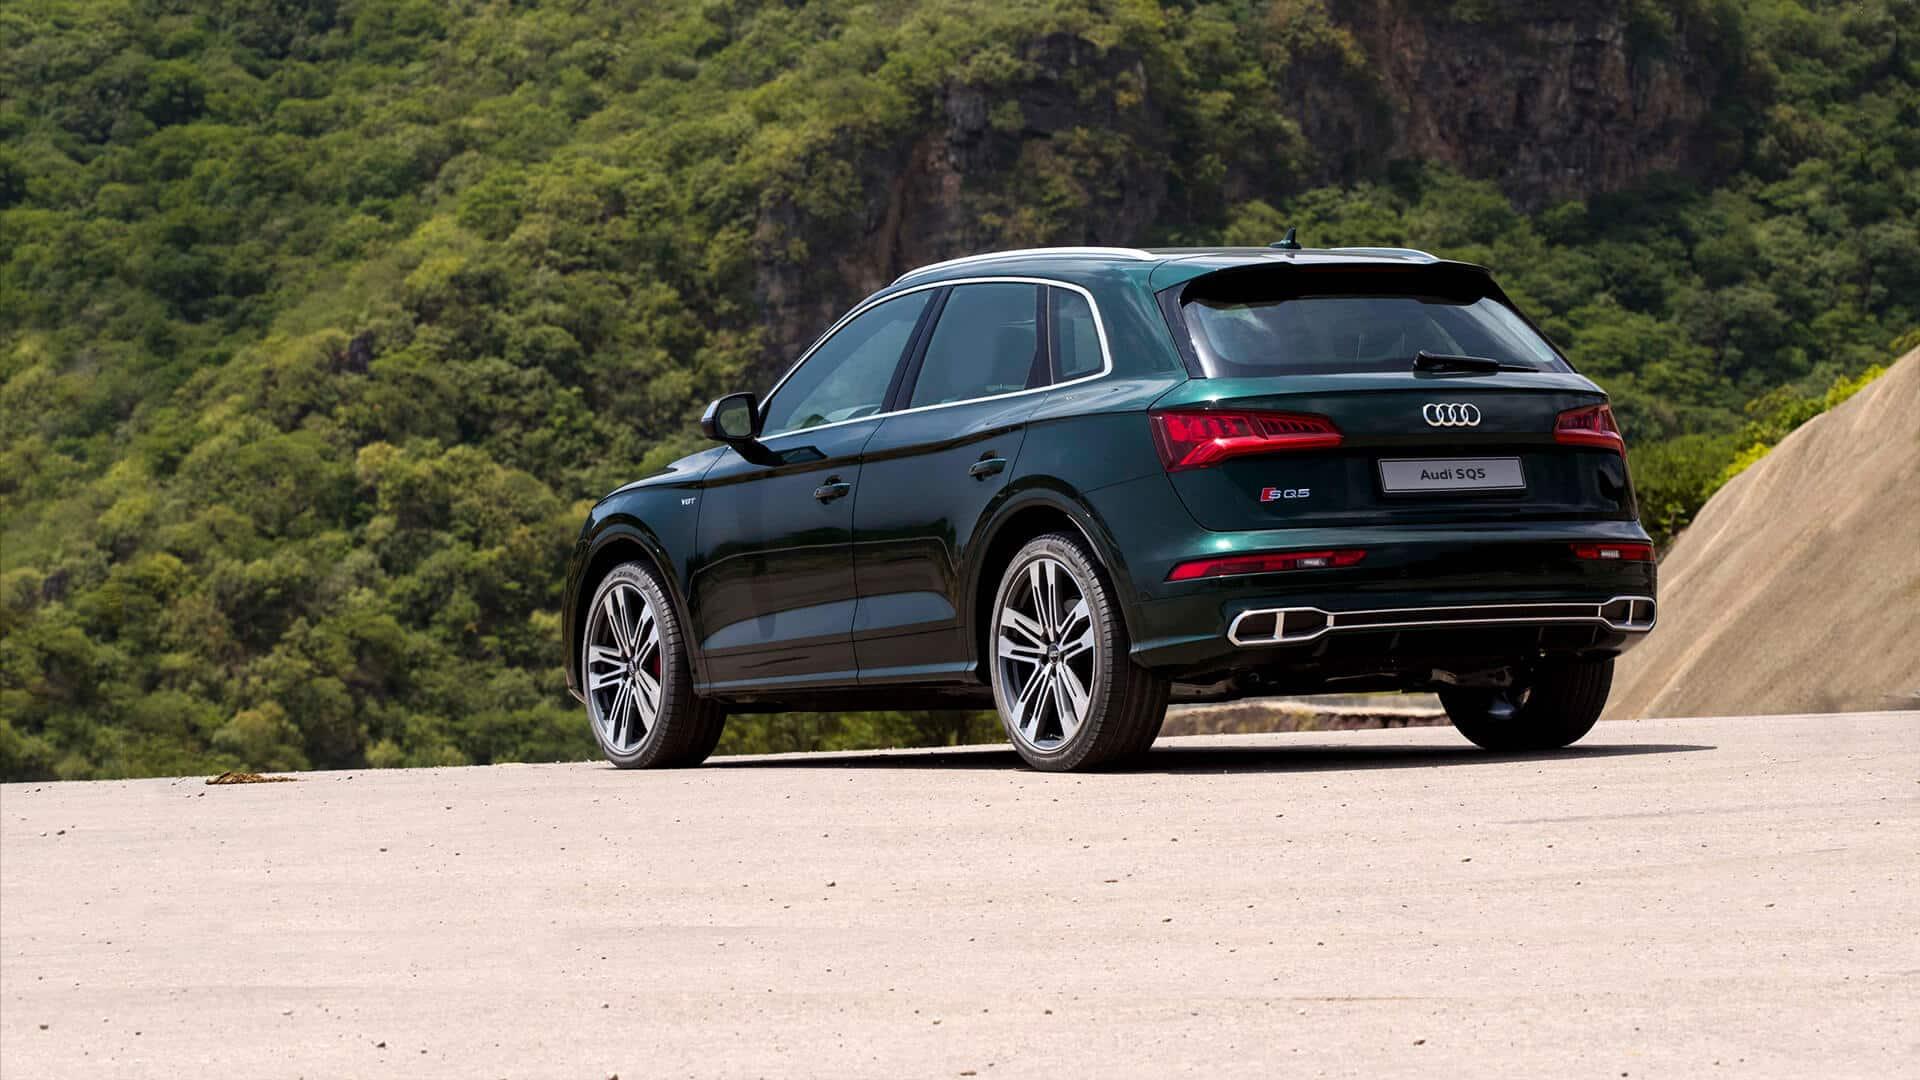 2020 Audi Sq5 New Review